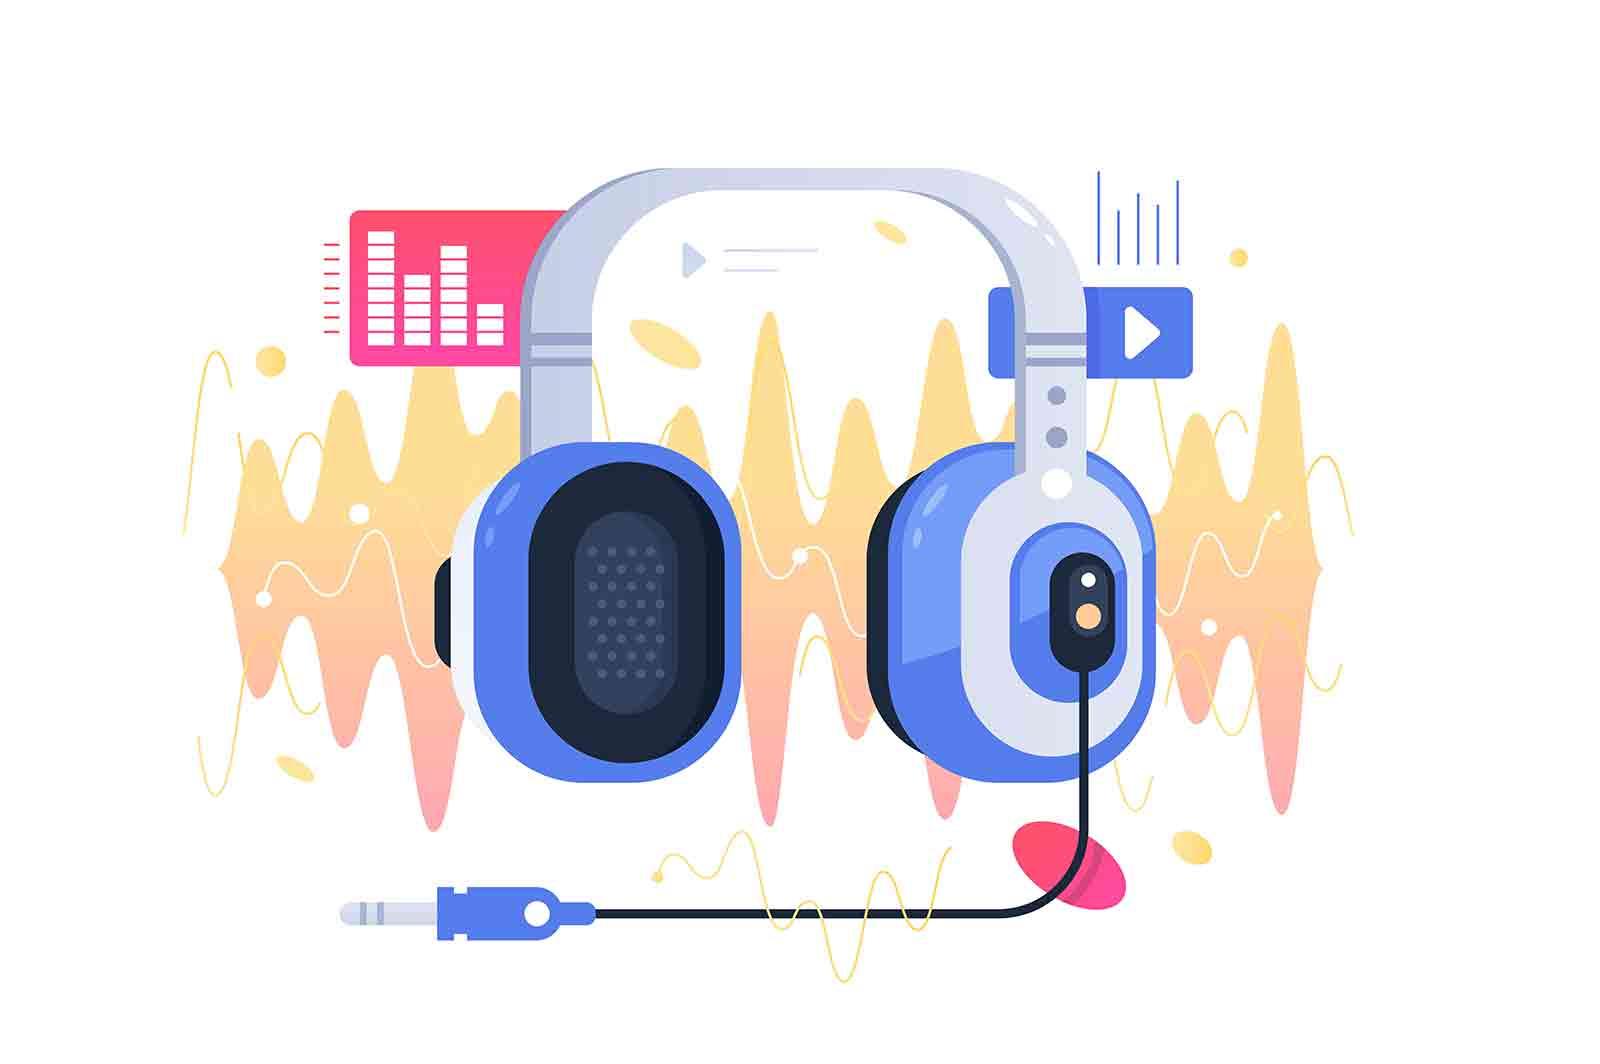 Modern headphones on sound wave illustration. Concept symbol device for listening music. Vector illustration.